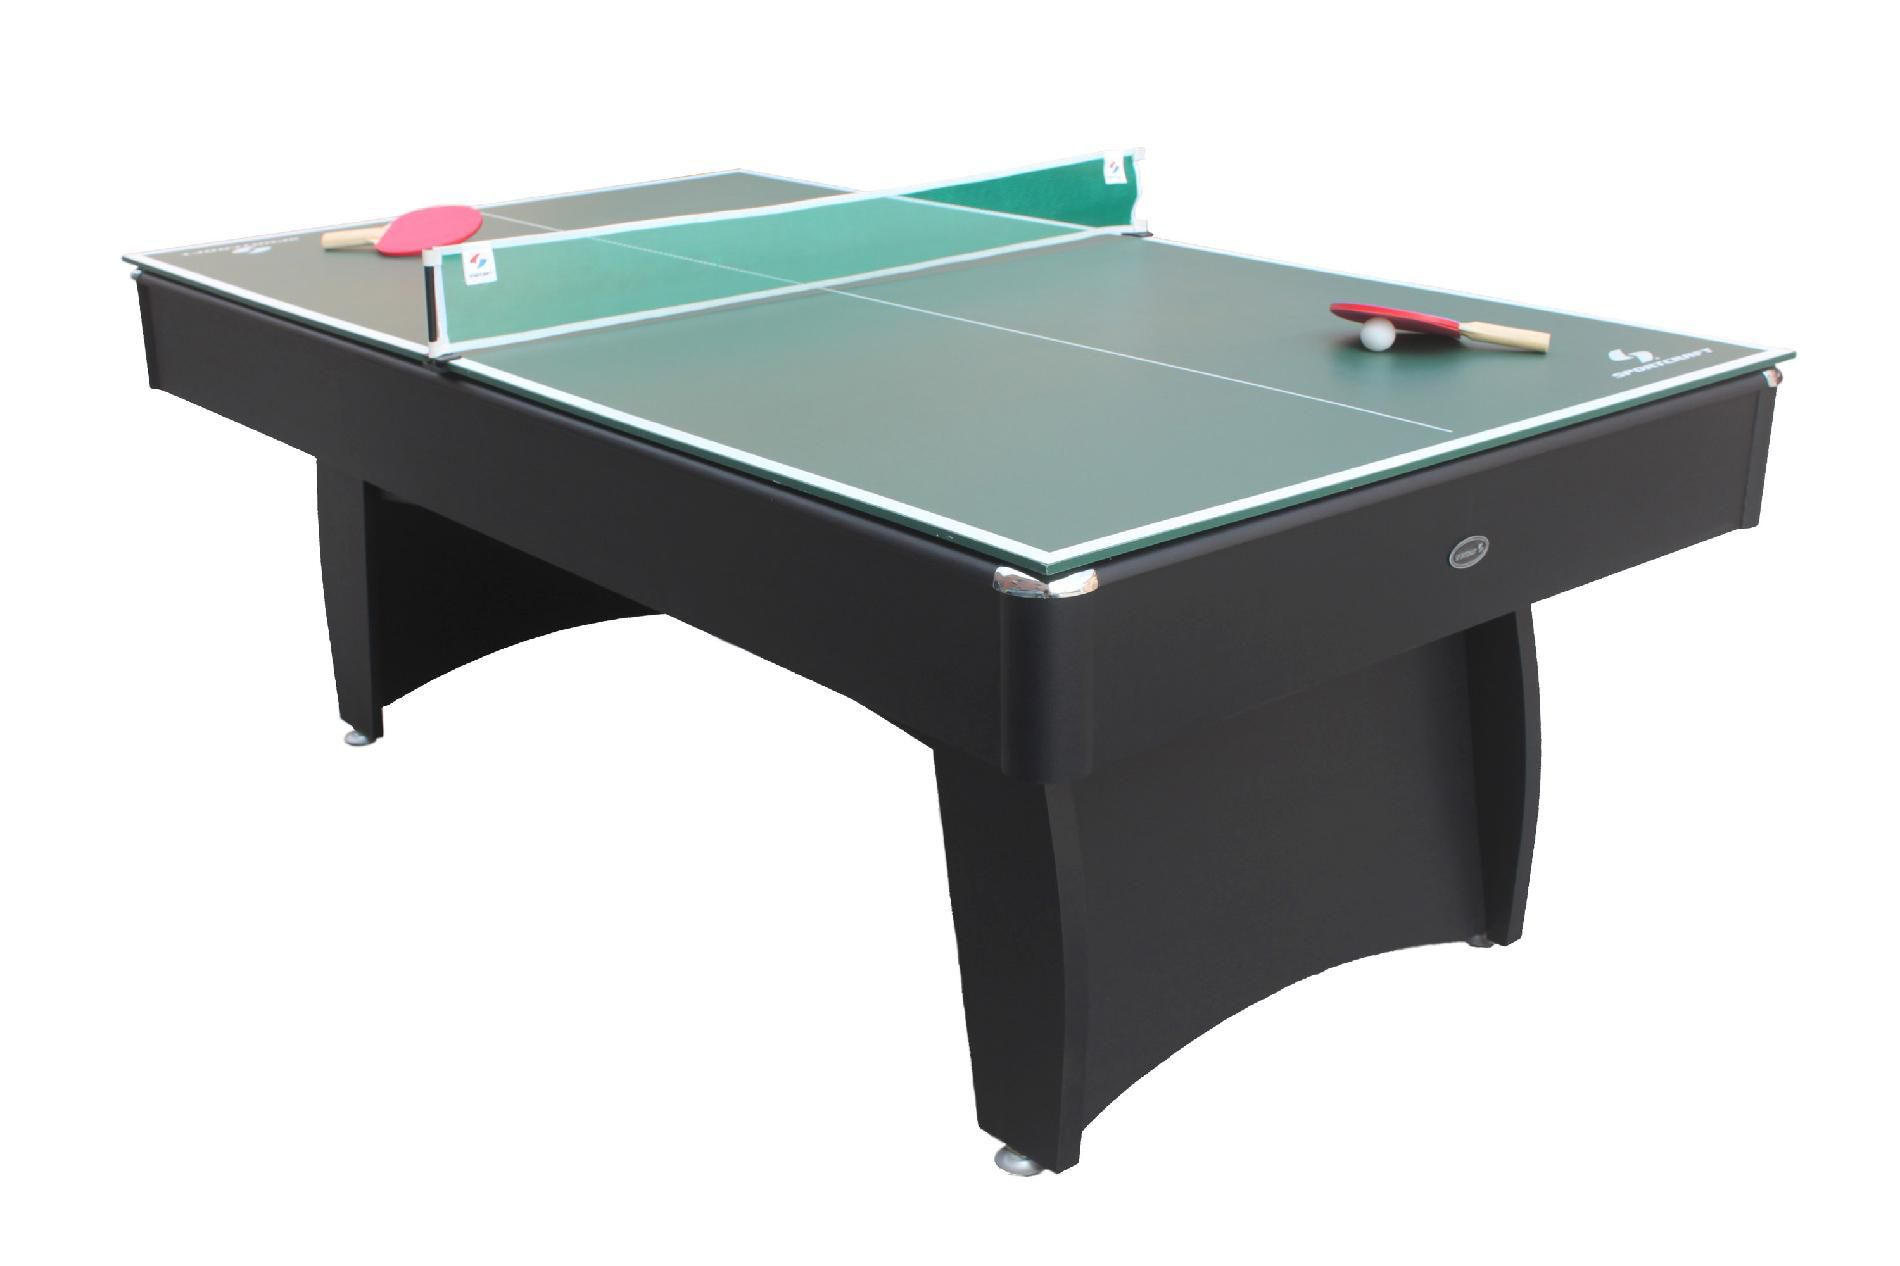 Sportcraft 7ft. Auburn Billiard Table with Bonus Table Tennis Top